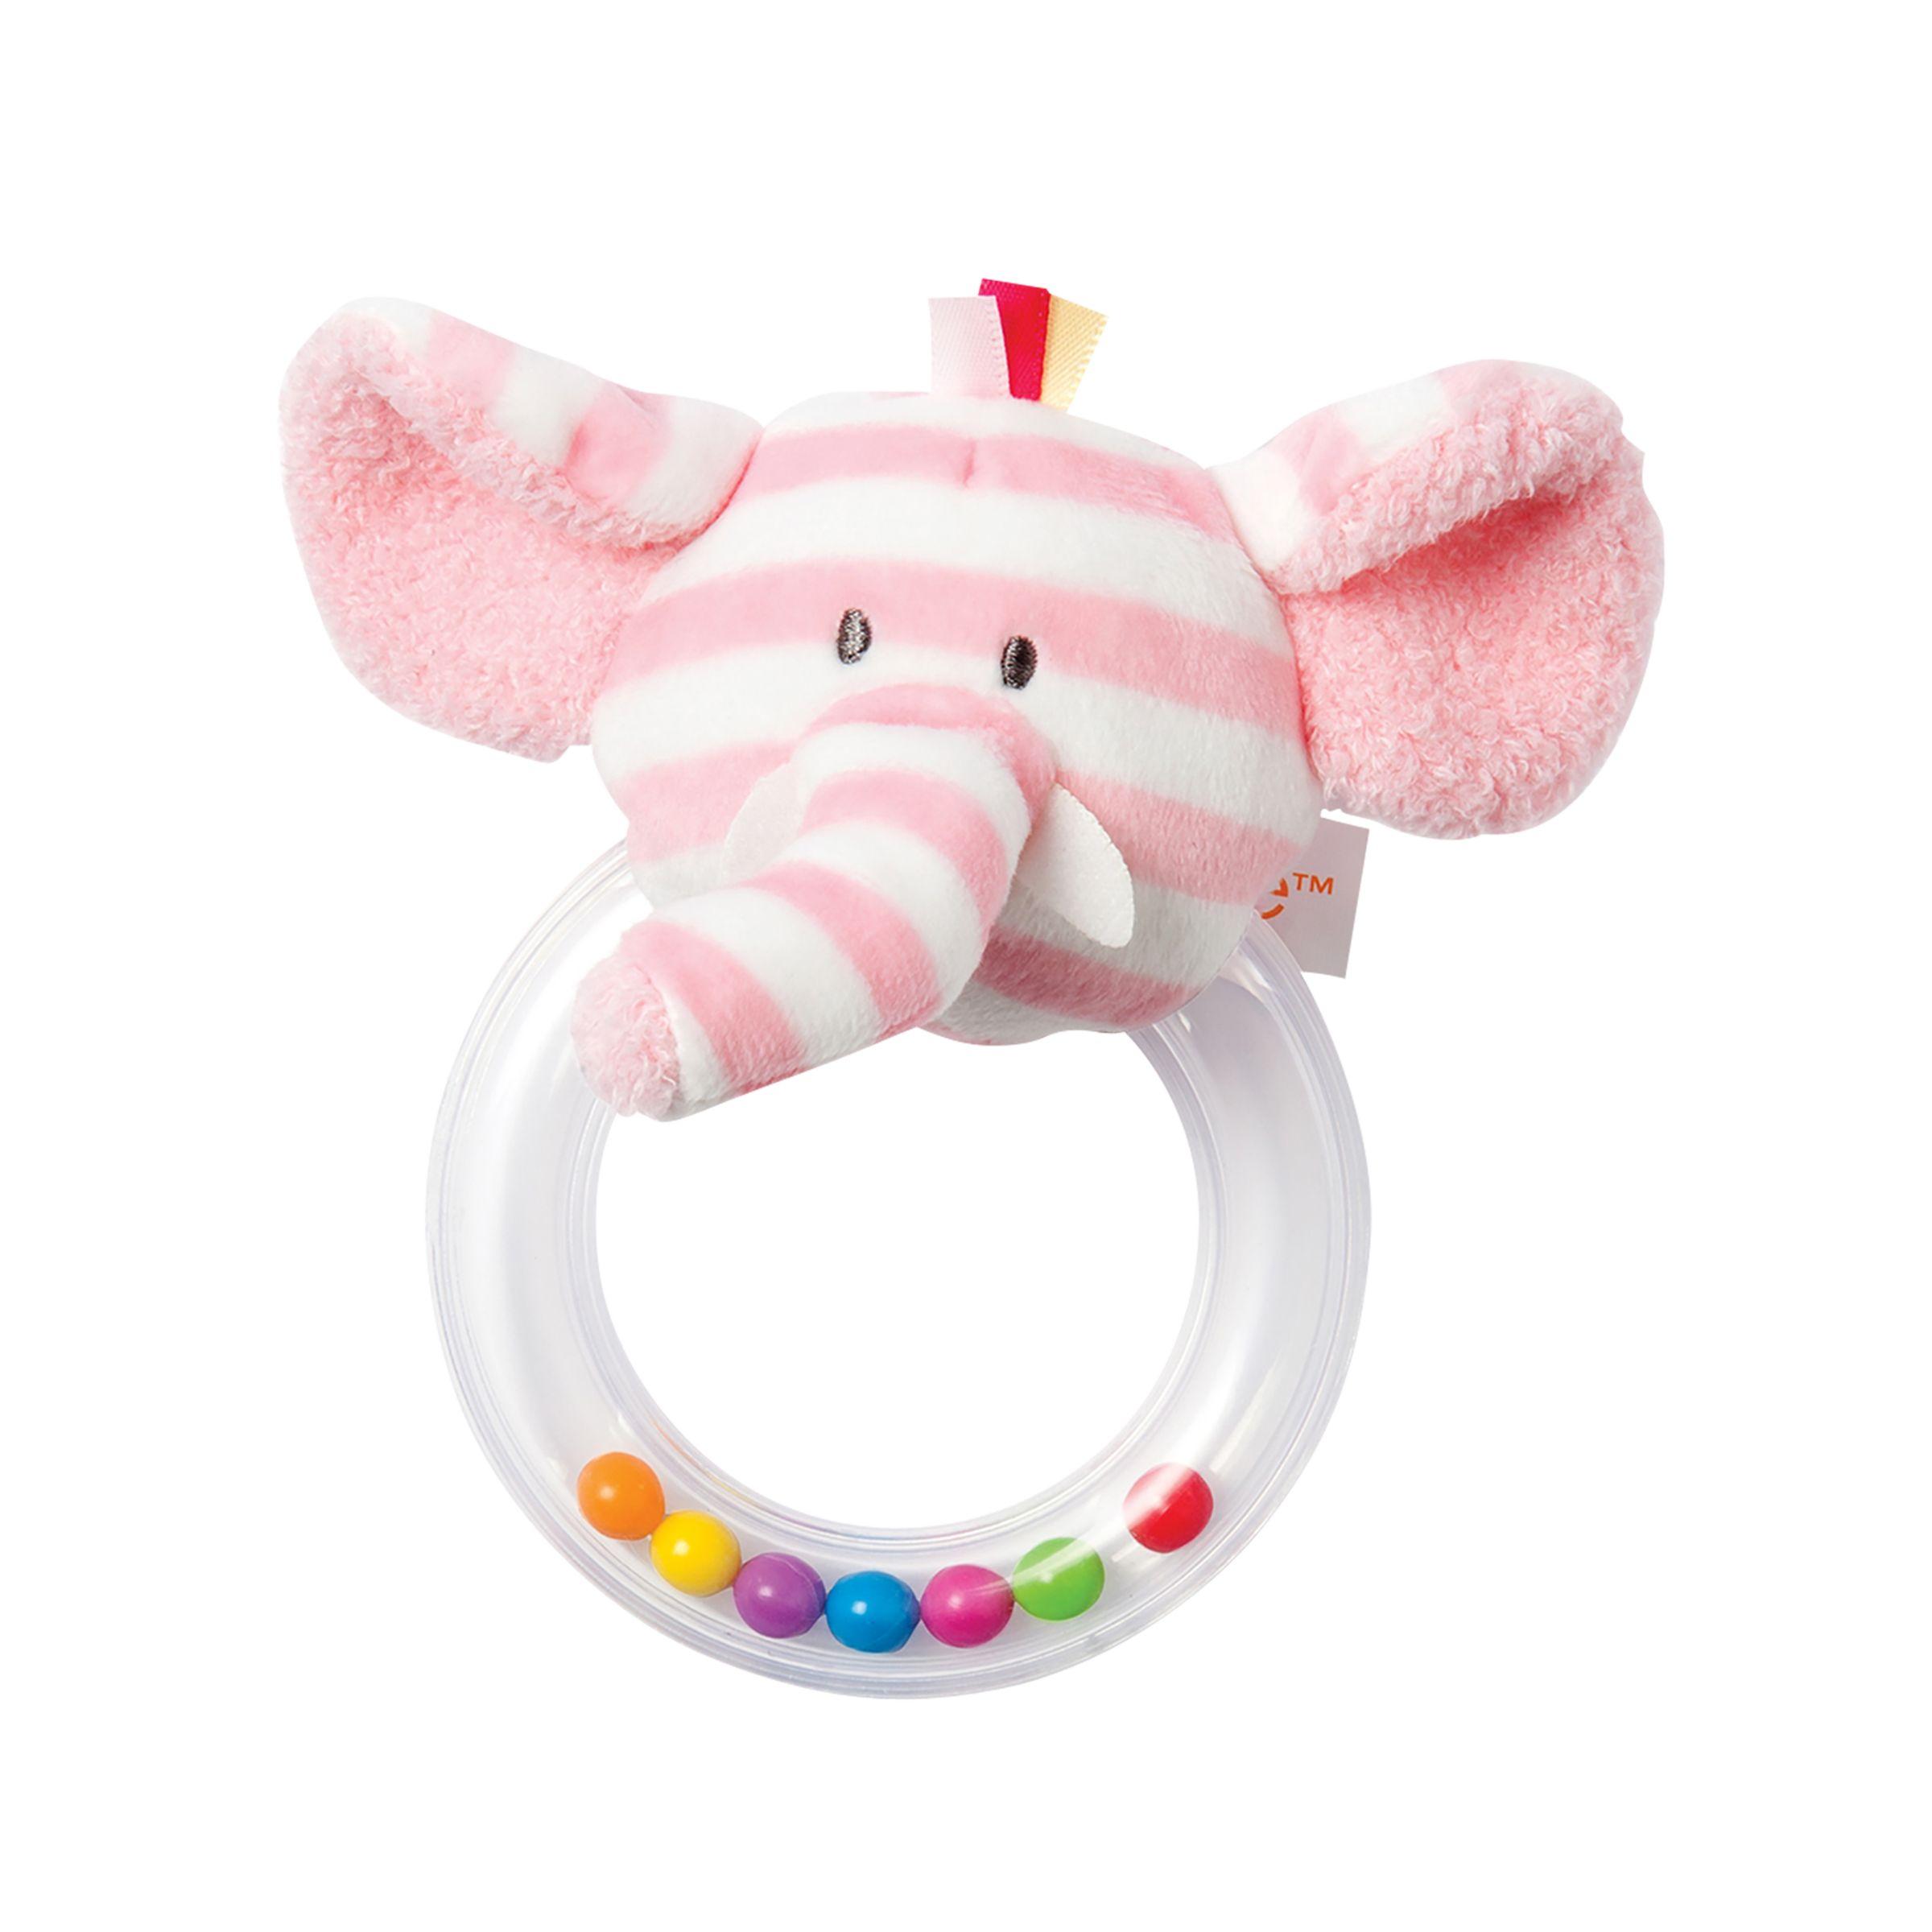 Manhattan Toy Manhattan Toy Giggle Elephant Soft Toy Ring Rattle